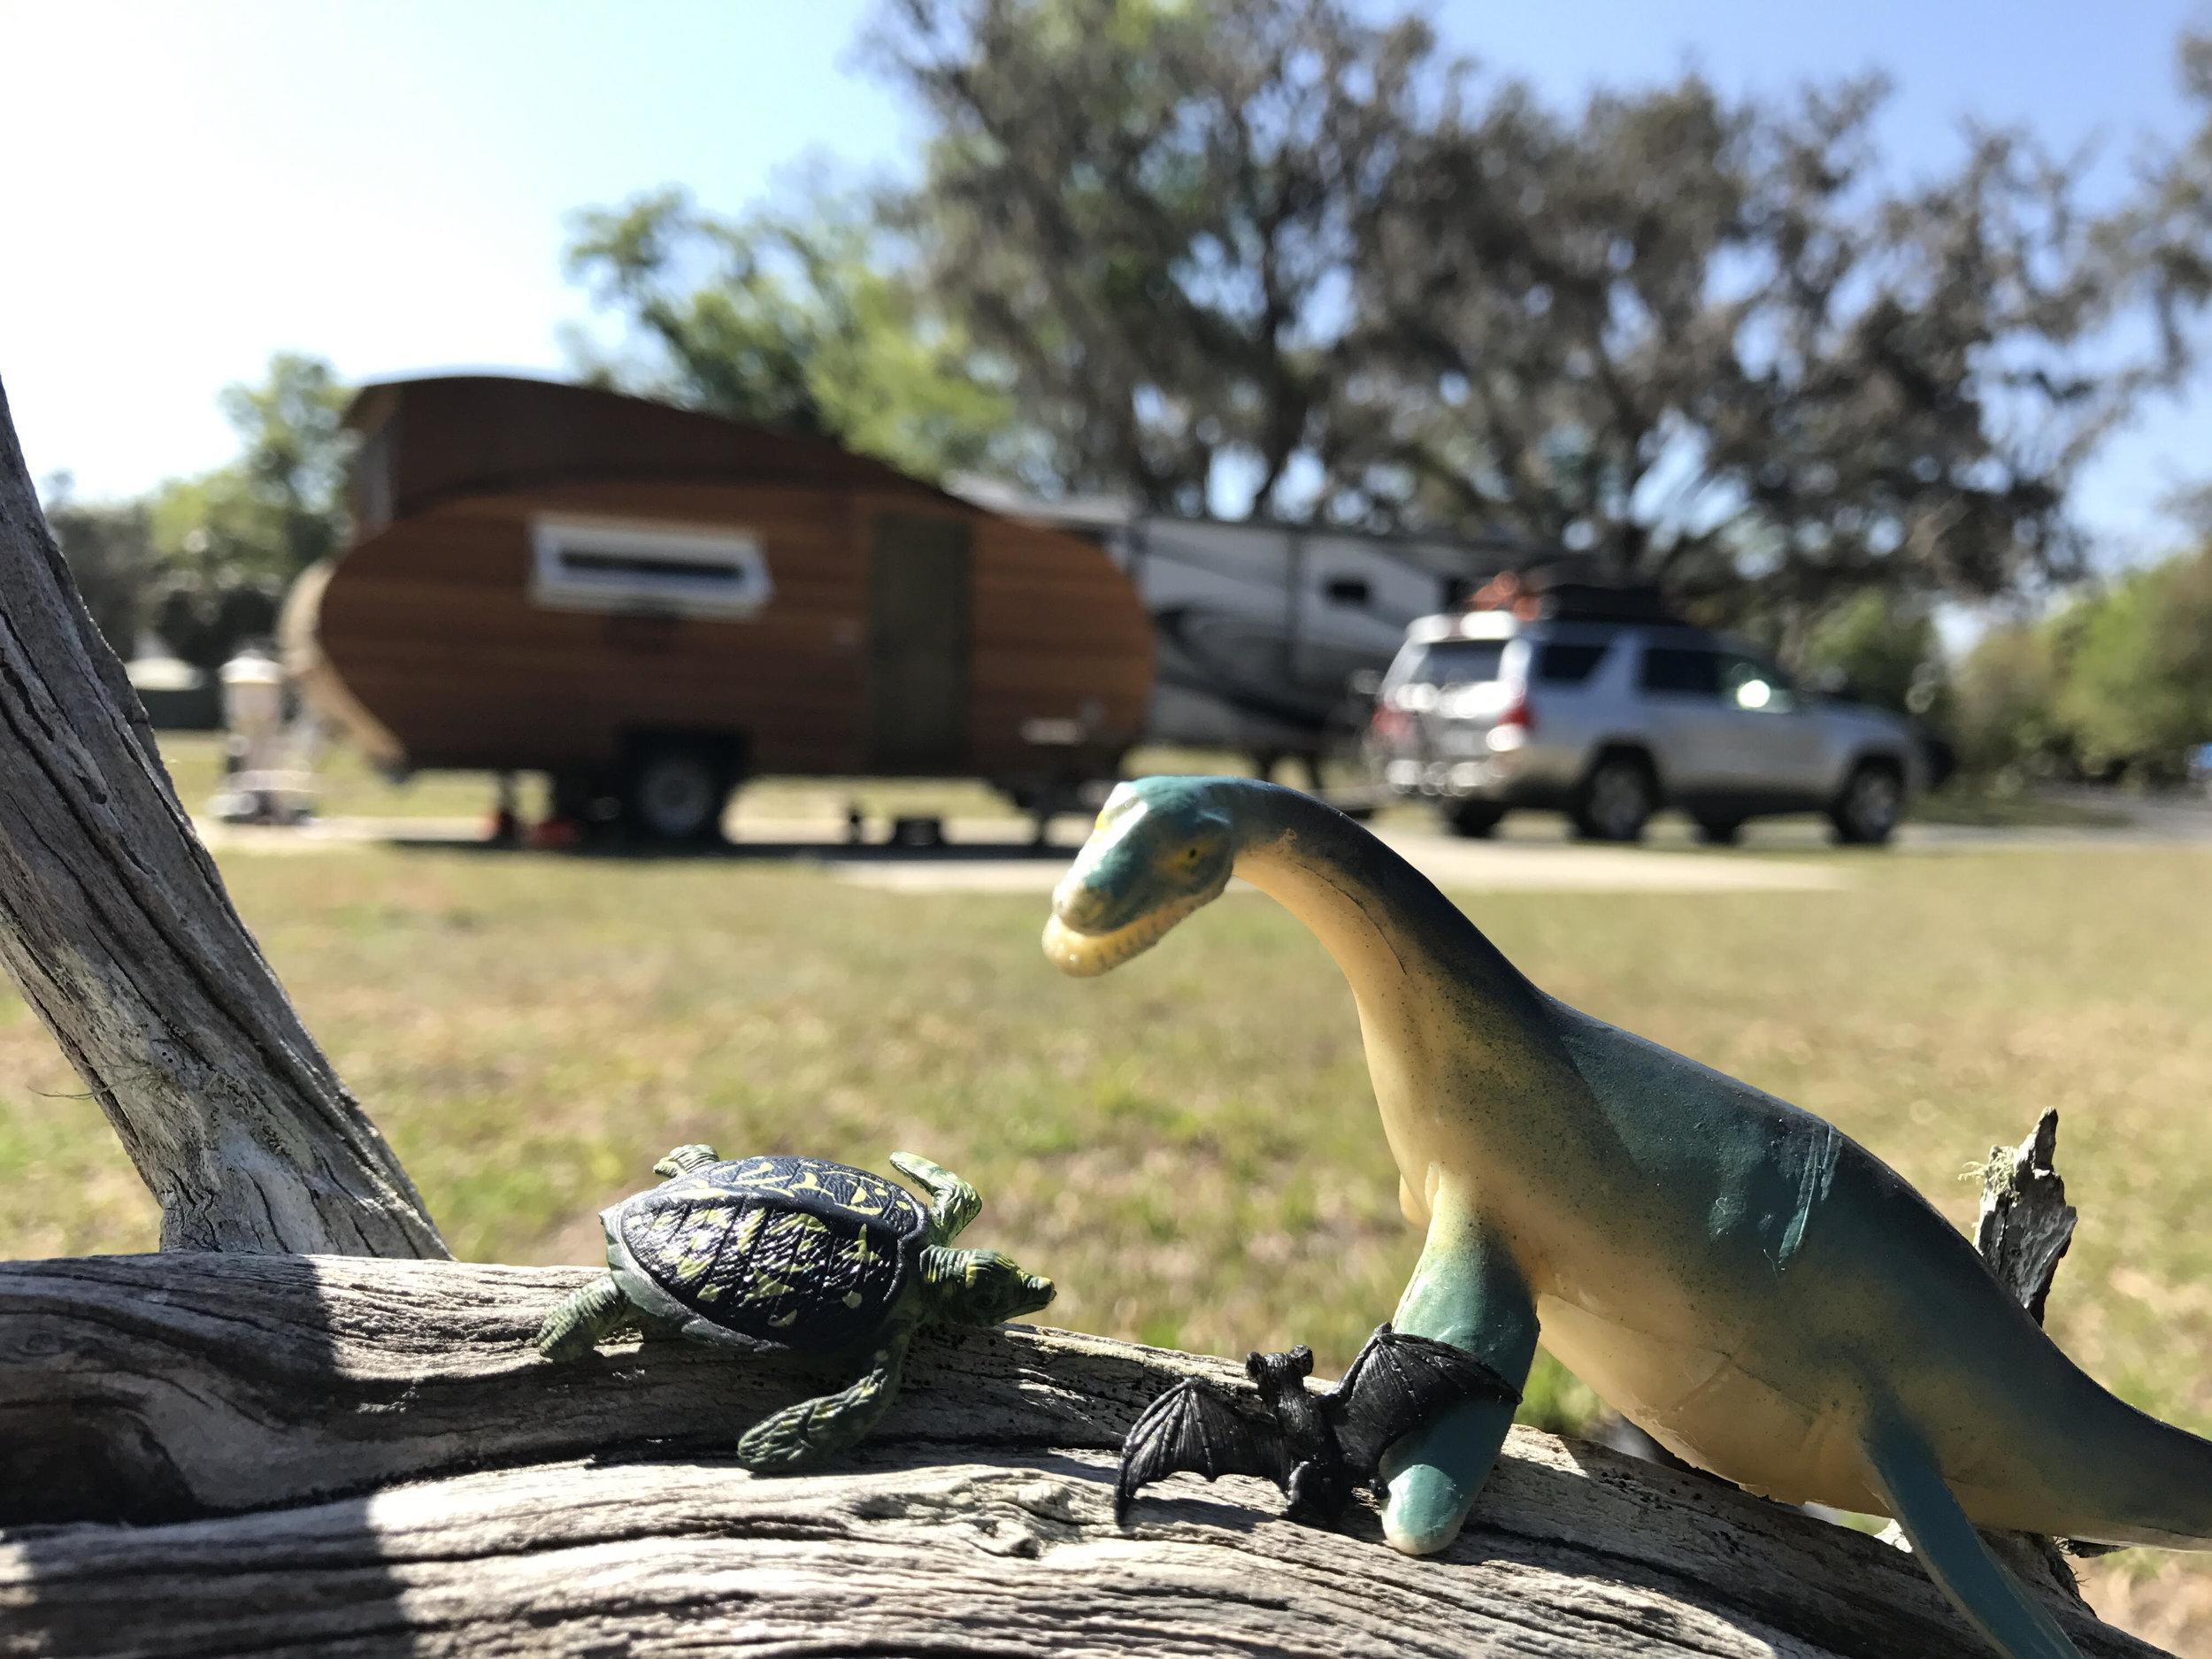 My traveling dinosaur found some friends!